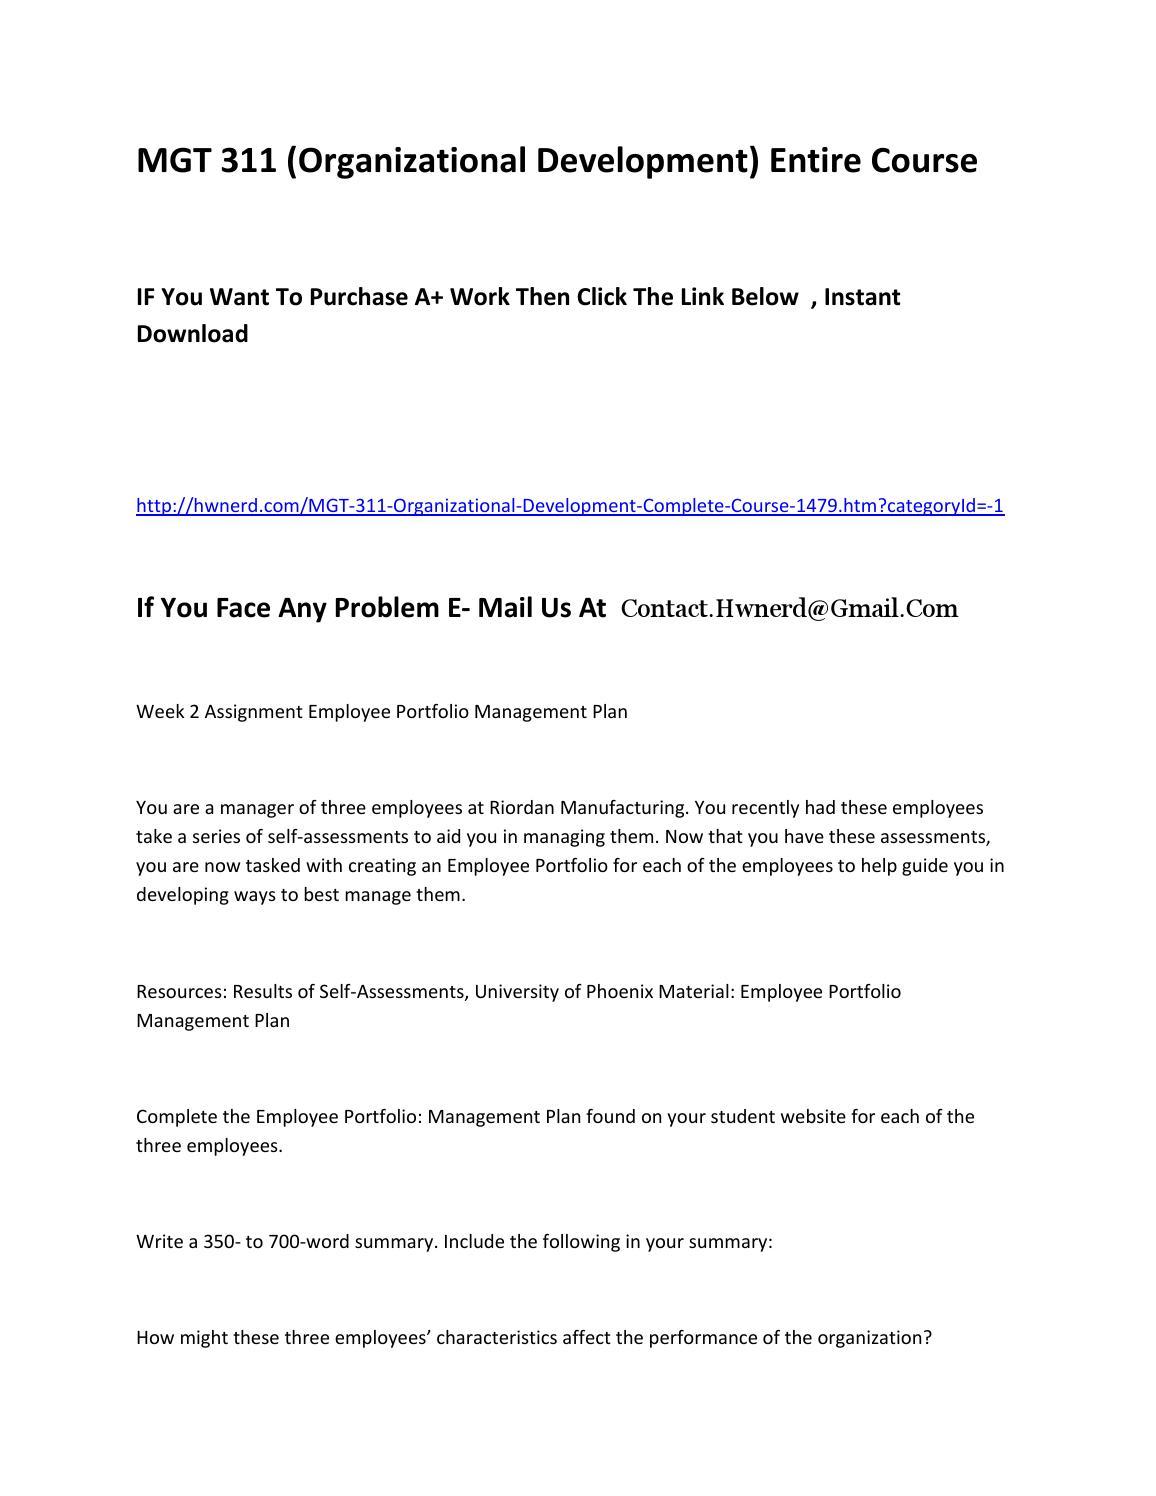 ielts table essay writing topics 2018